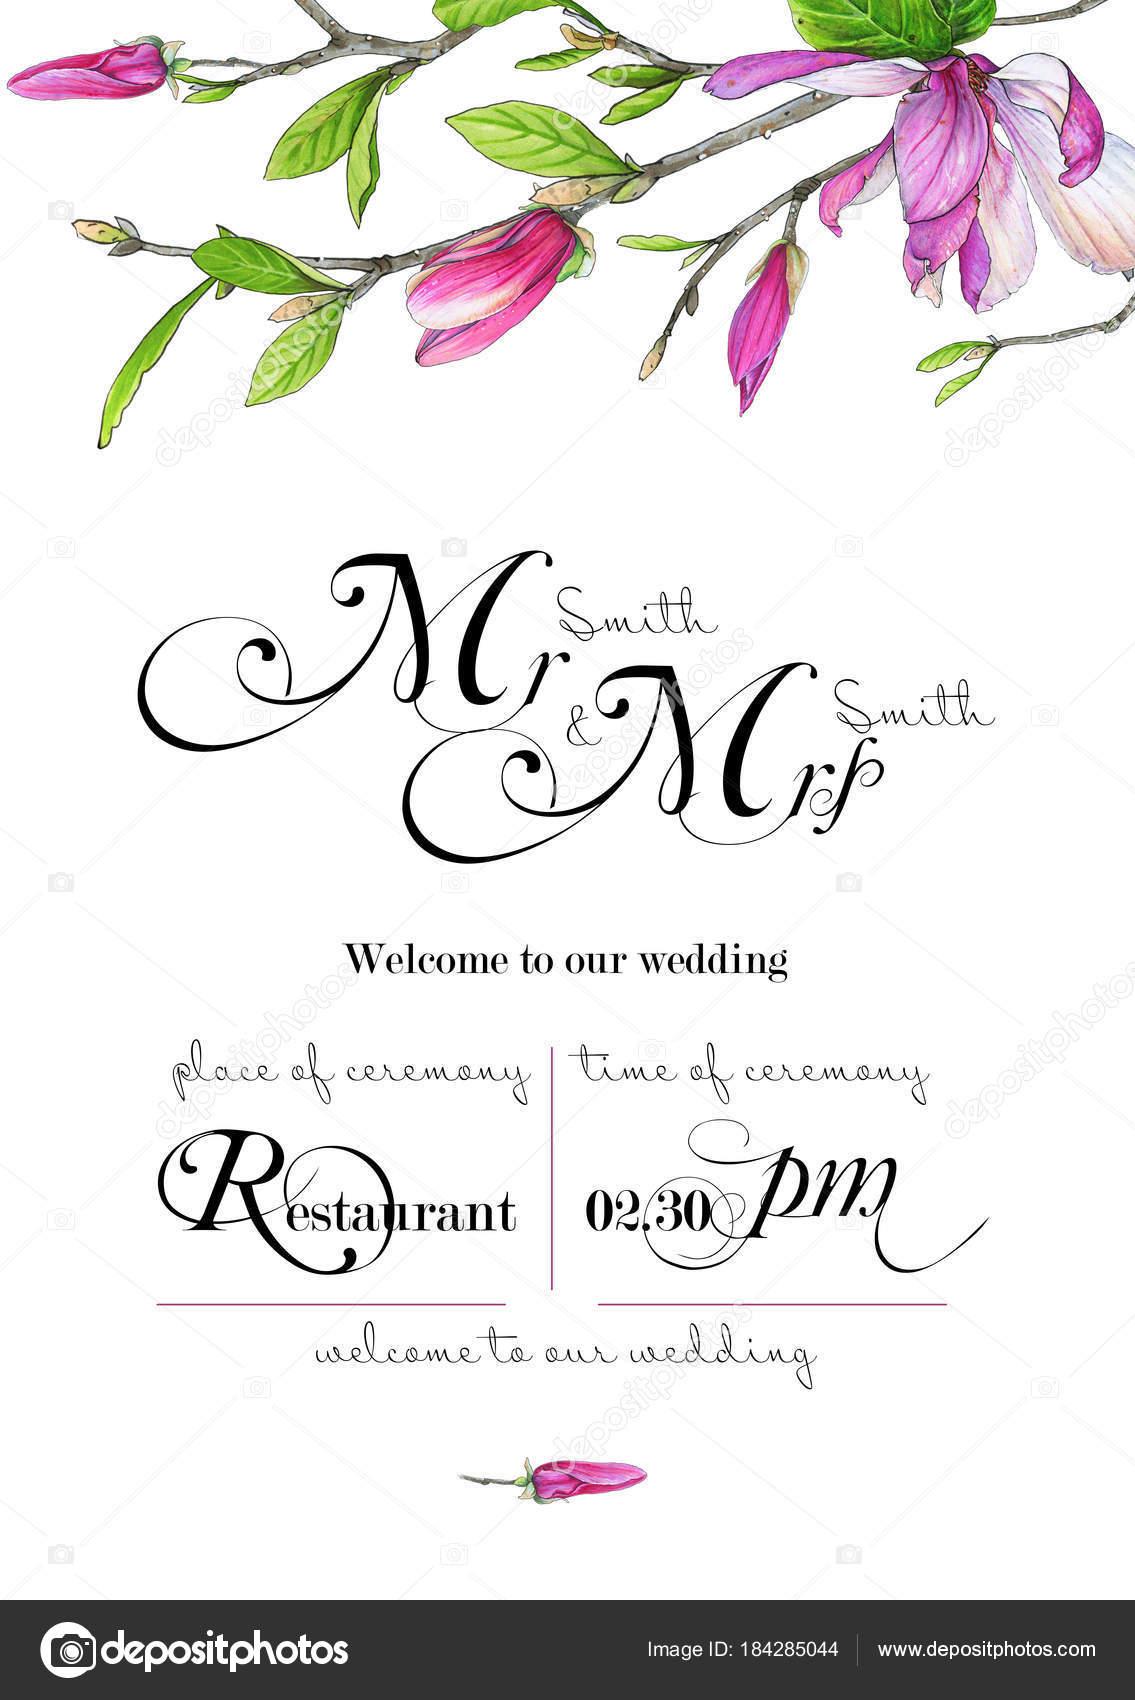 template congratulations invitations wedding green pink colors